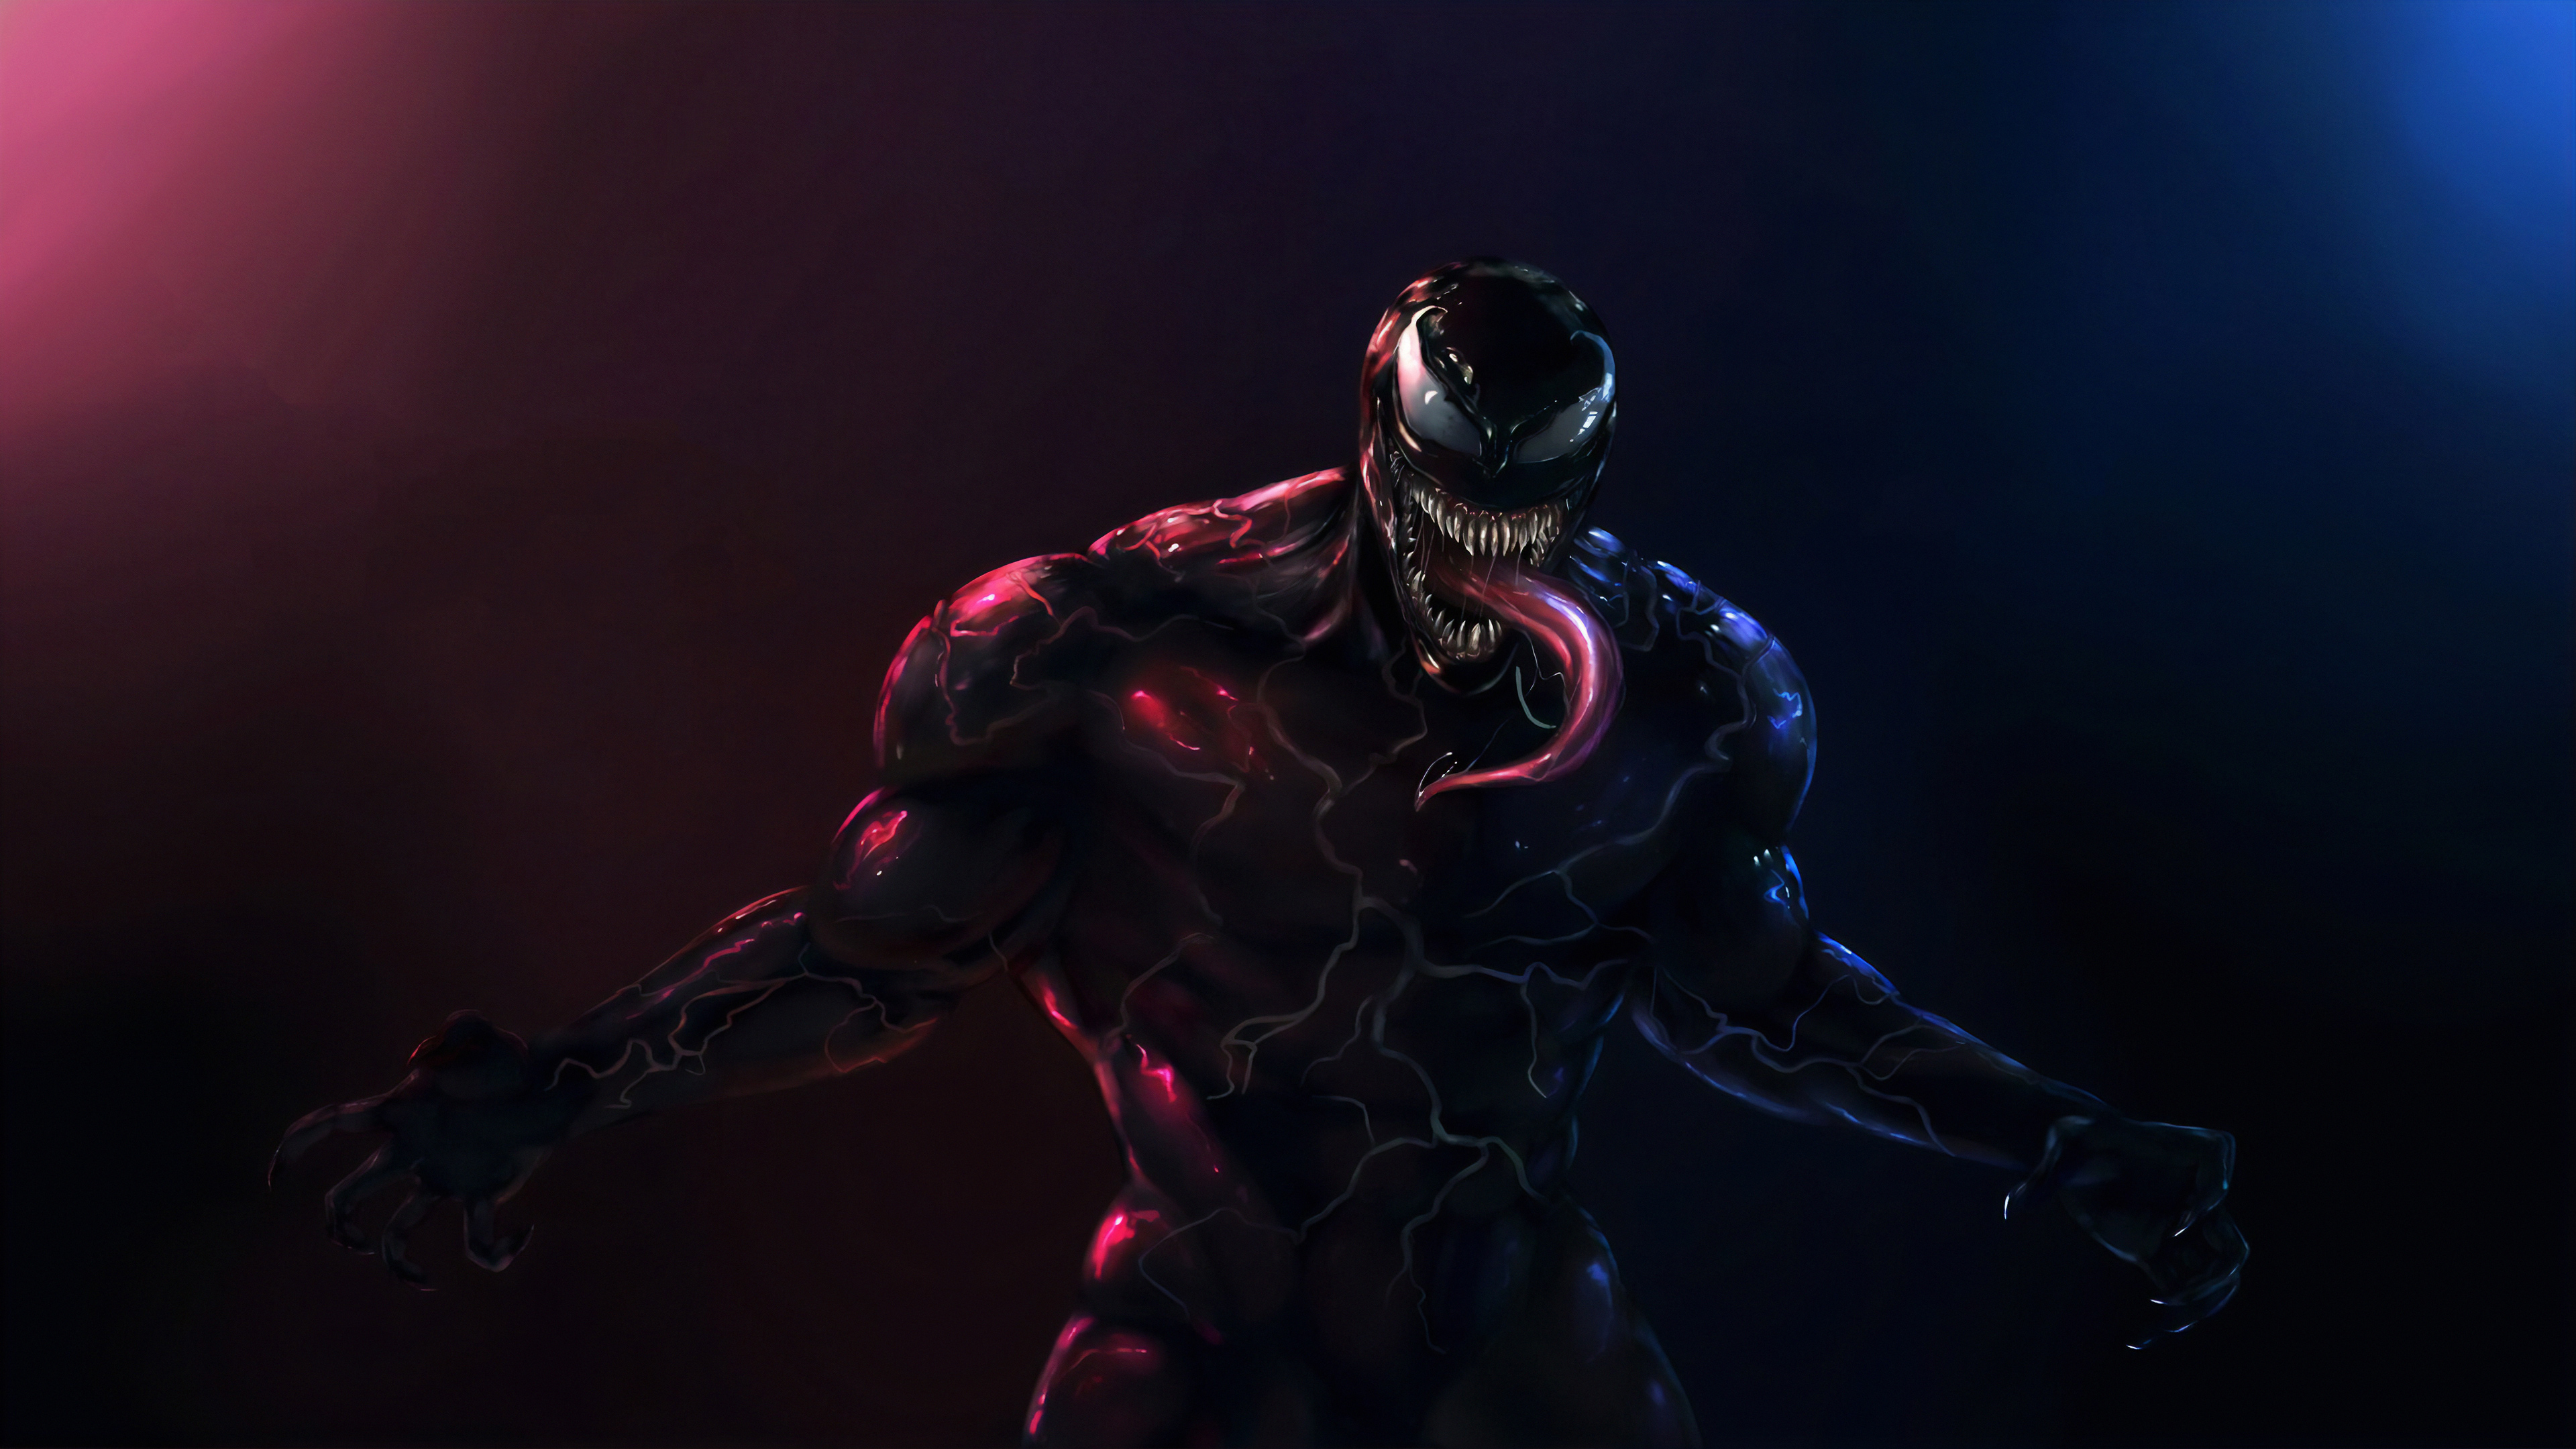 venom danger 1570394632 - Venom Danger - Venom wallpapers, supervillain wallpapers, hd-wallpapers, digital art wallpapers, deviantart wallpapers, artwork wallpapers, art wallpapers, 4k-wallpapers